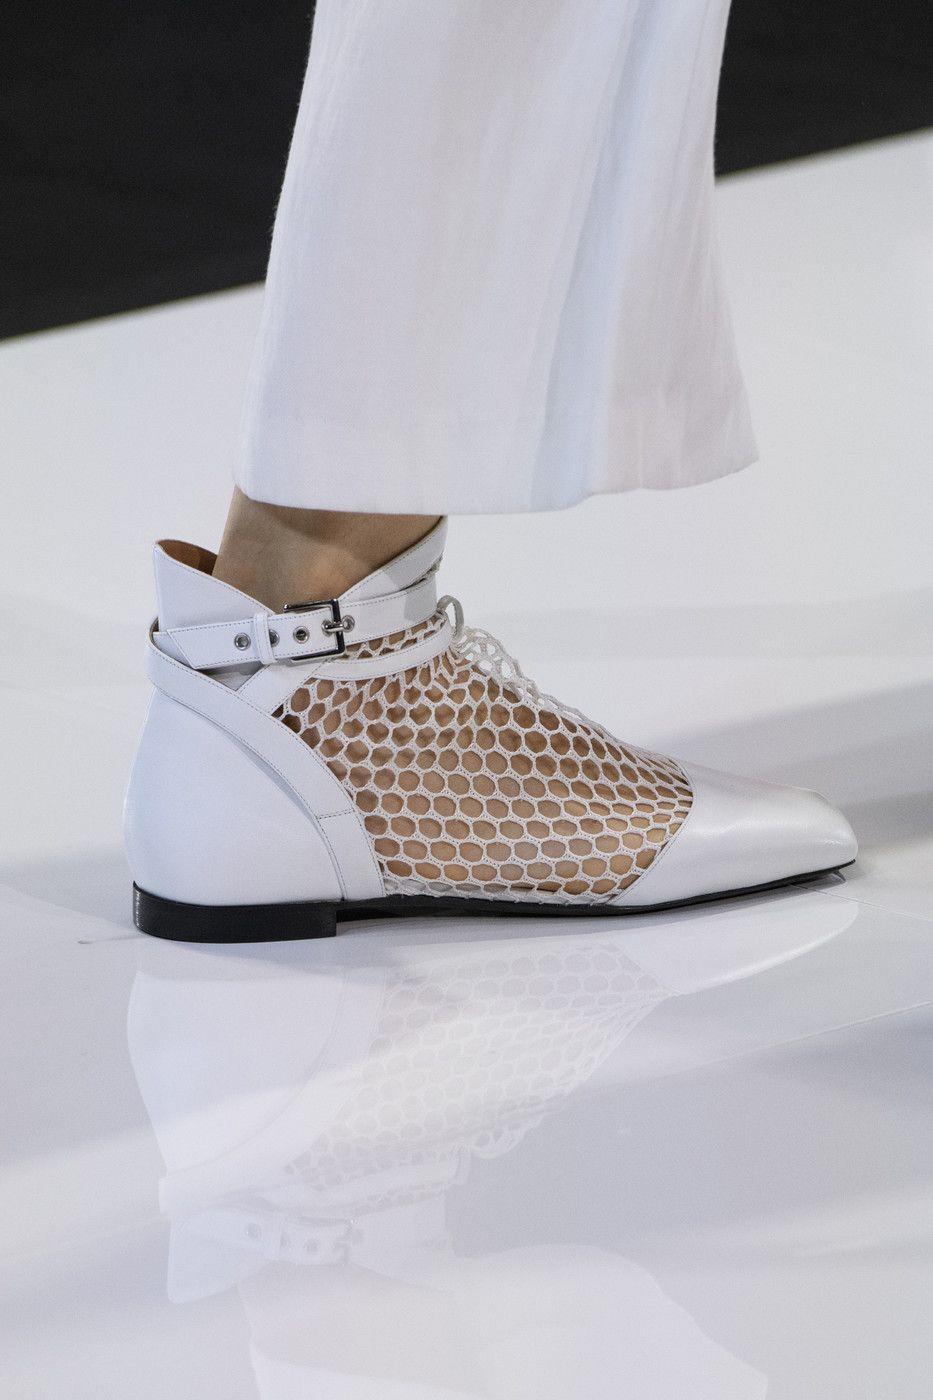 grosor ciervo Desacuerdo  Emporio Armani at London Fashion Week Spring 2018   Trending shoes,  Celebrity shoes, Trending womens shoes